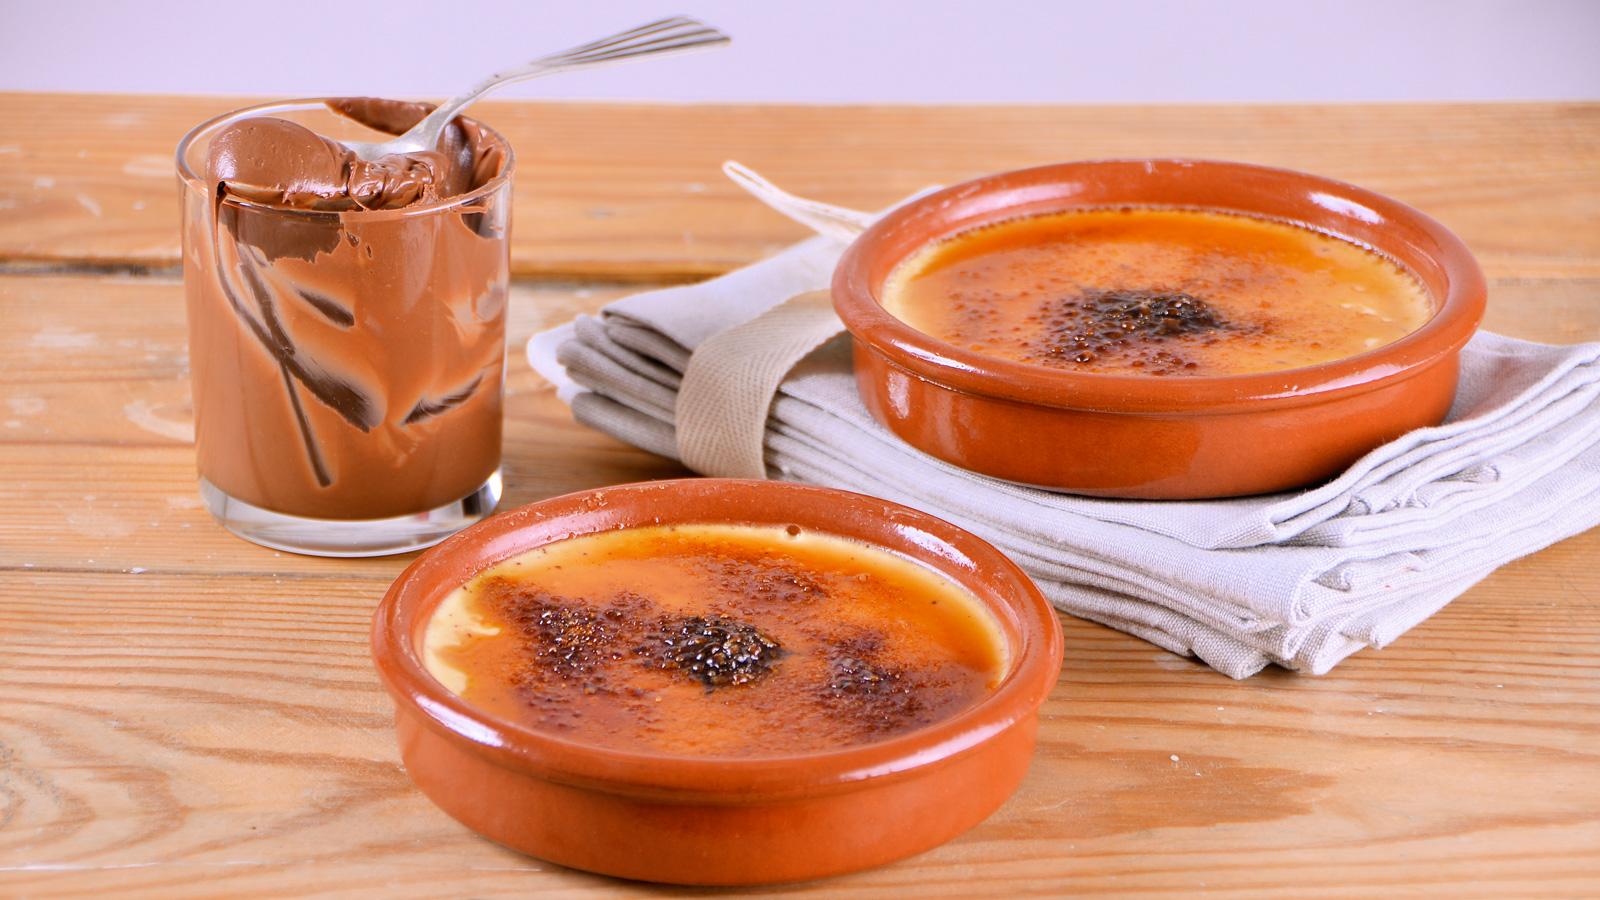 Cr me brulee de chocolate y avellanas alma obreg n for Canal cocina alma obregon